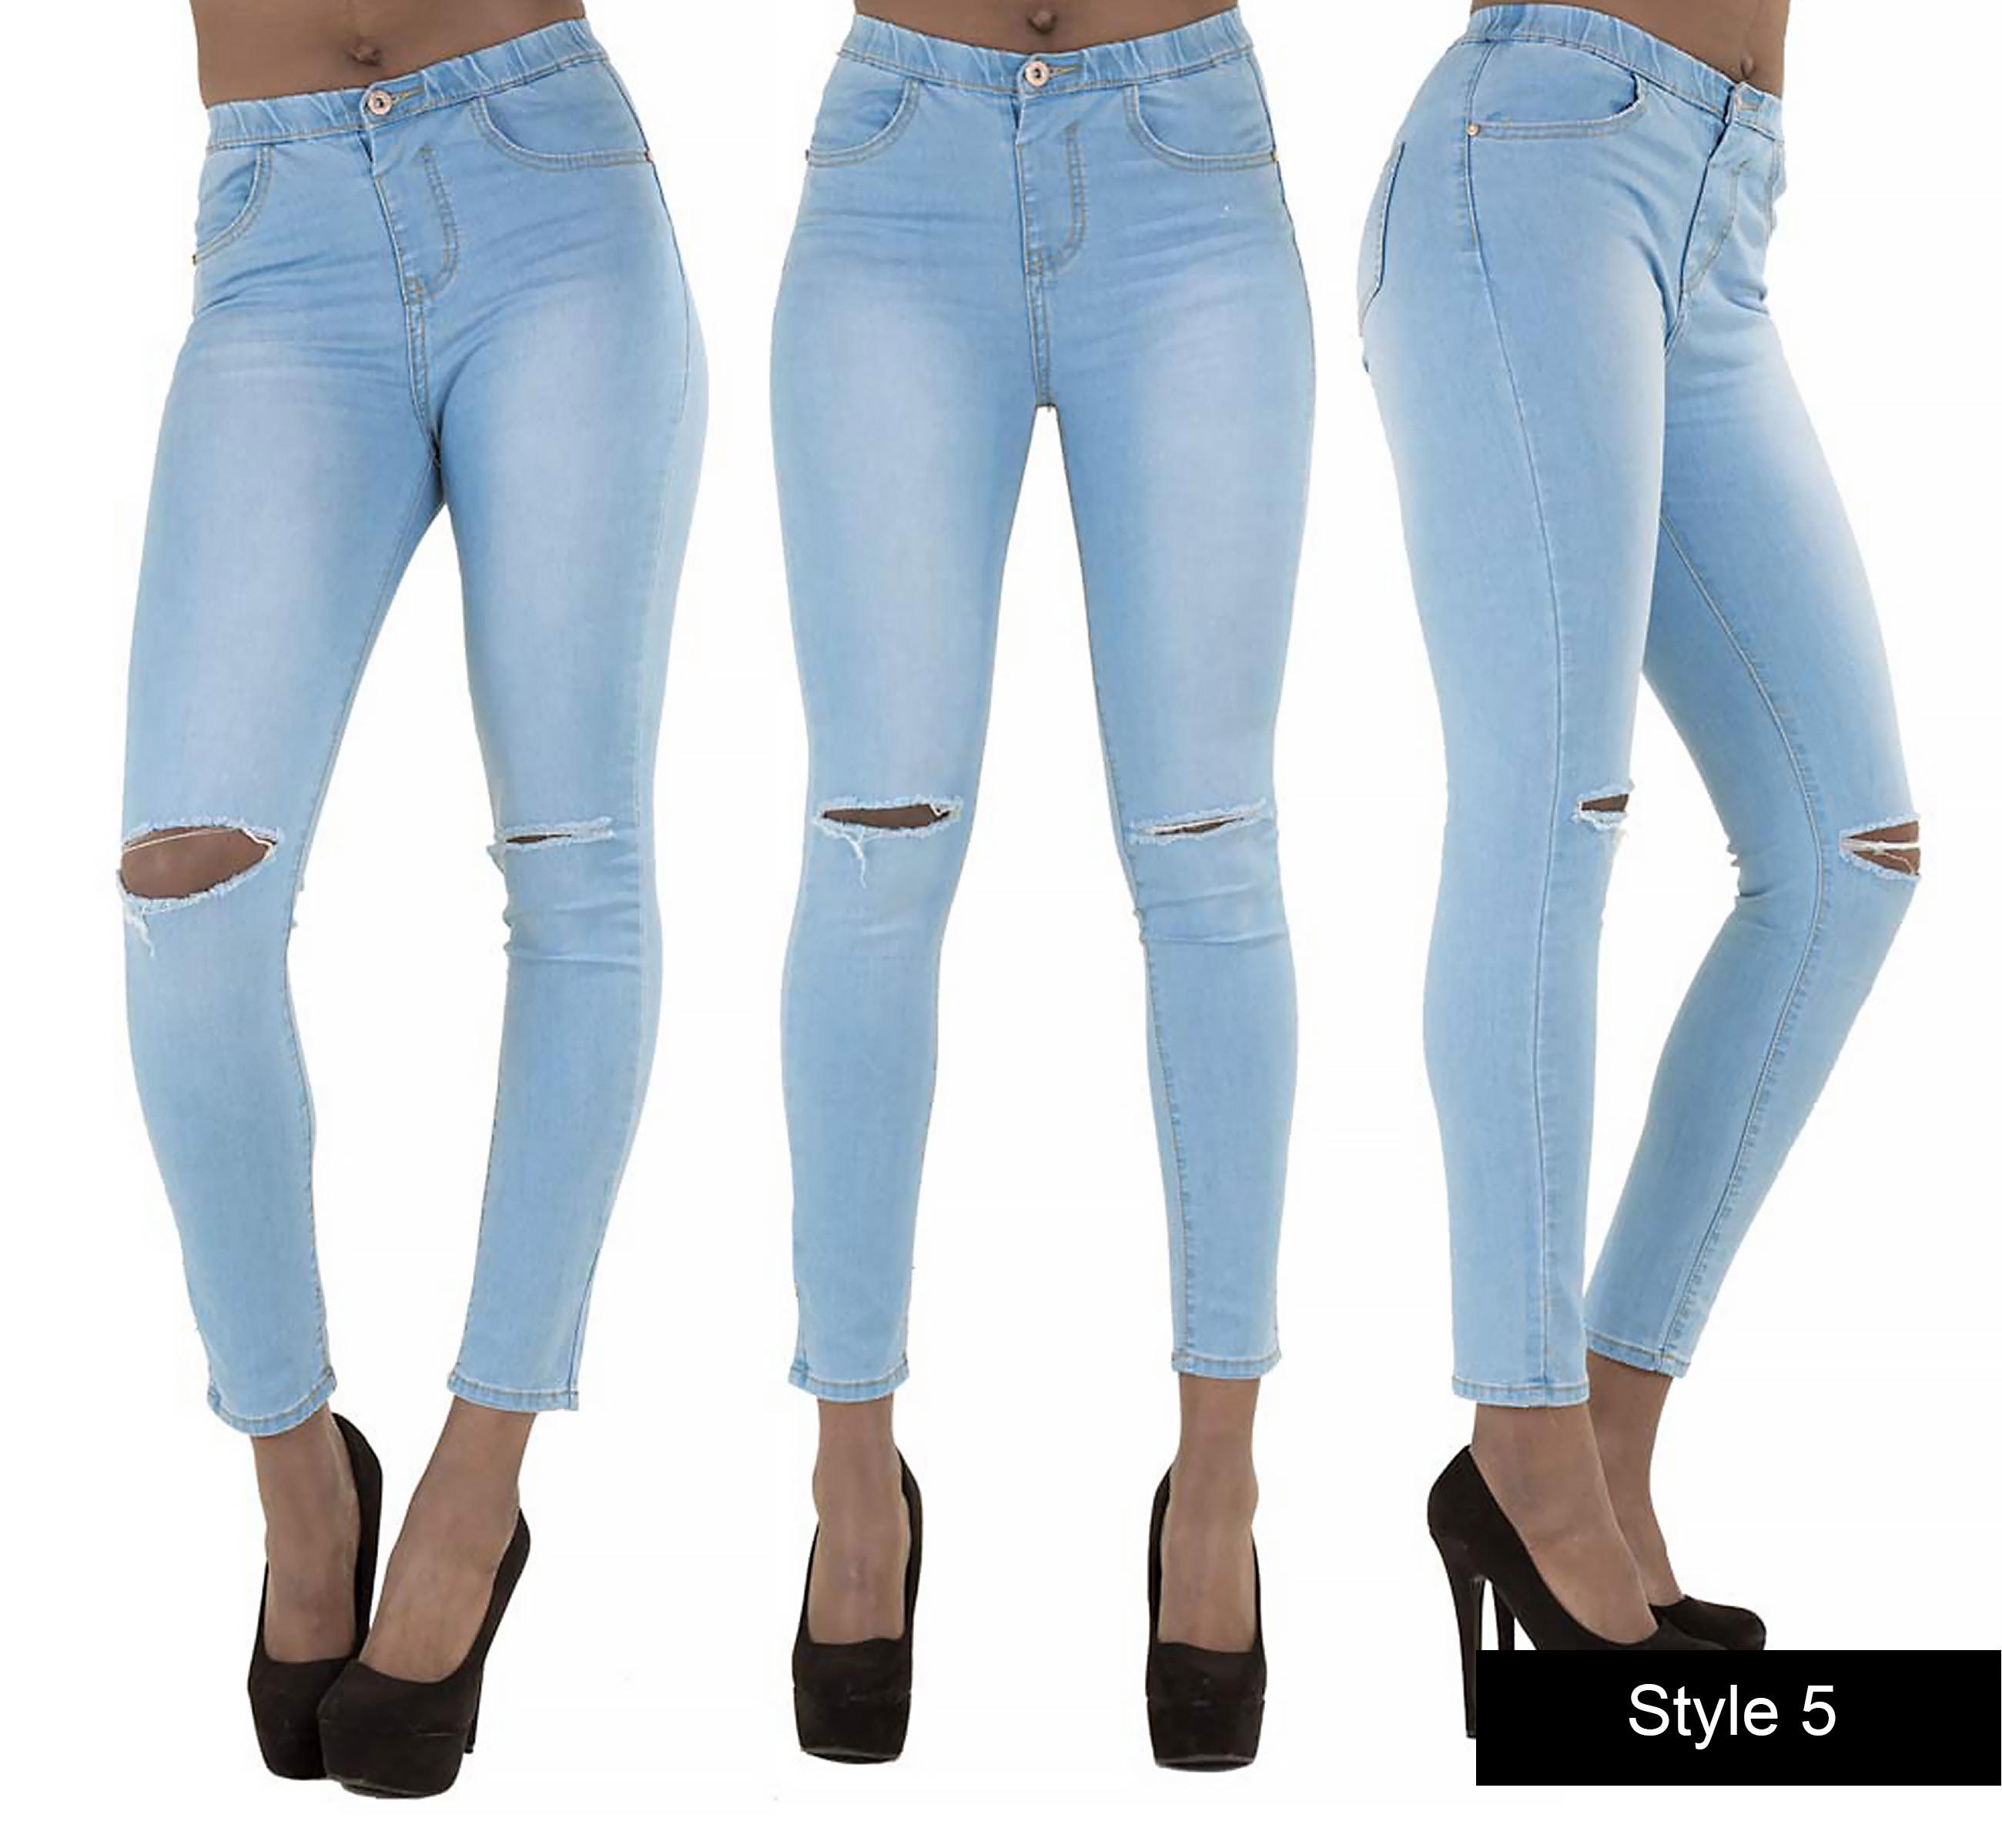 Ladies Womens High Waisted Ripped Knee Skinny Jeans White Denim ...